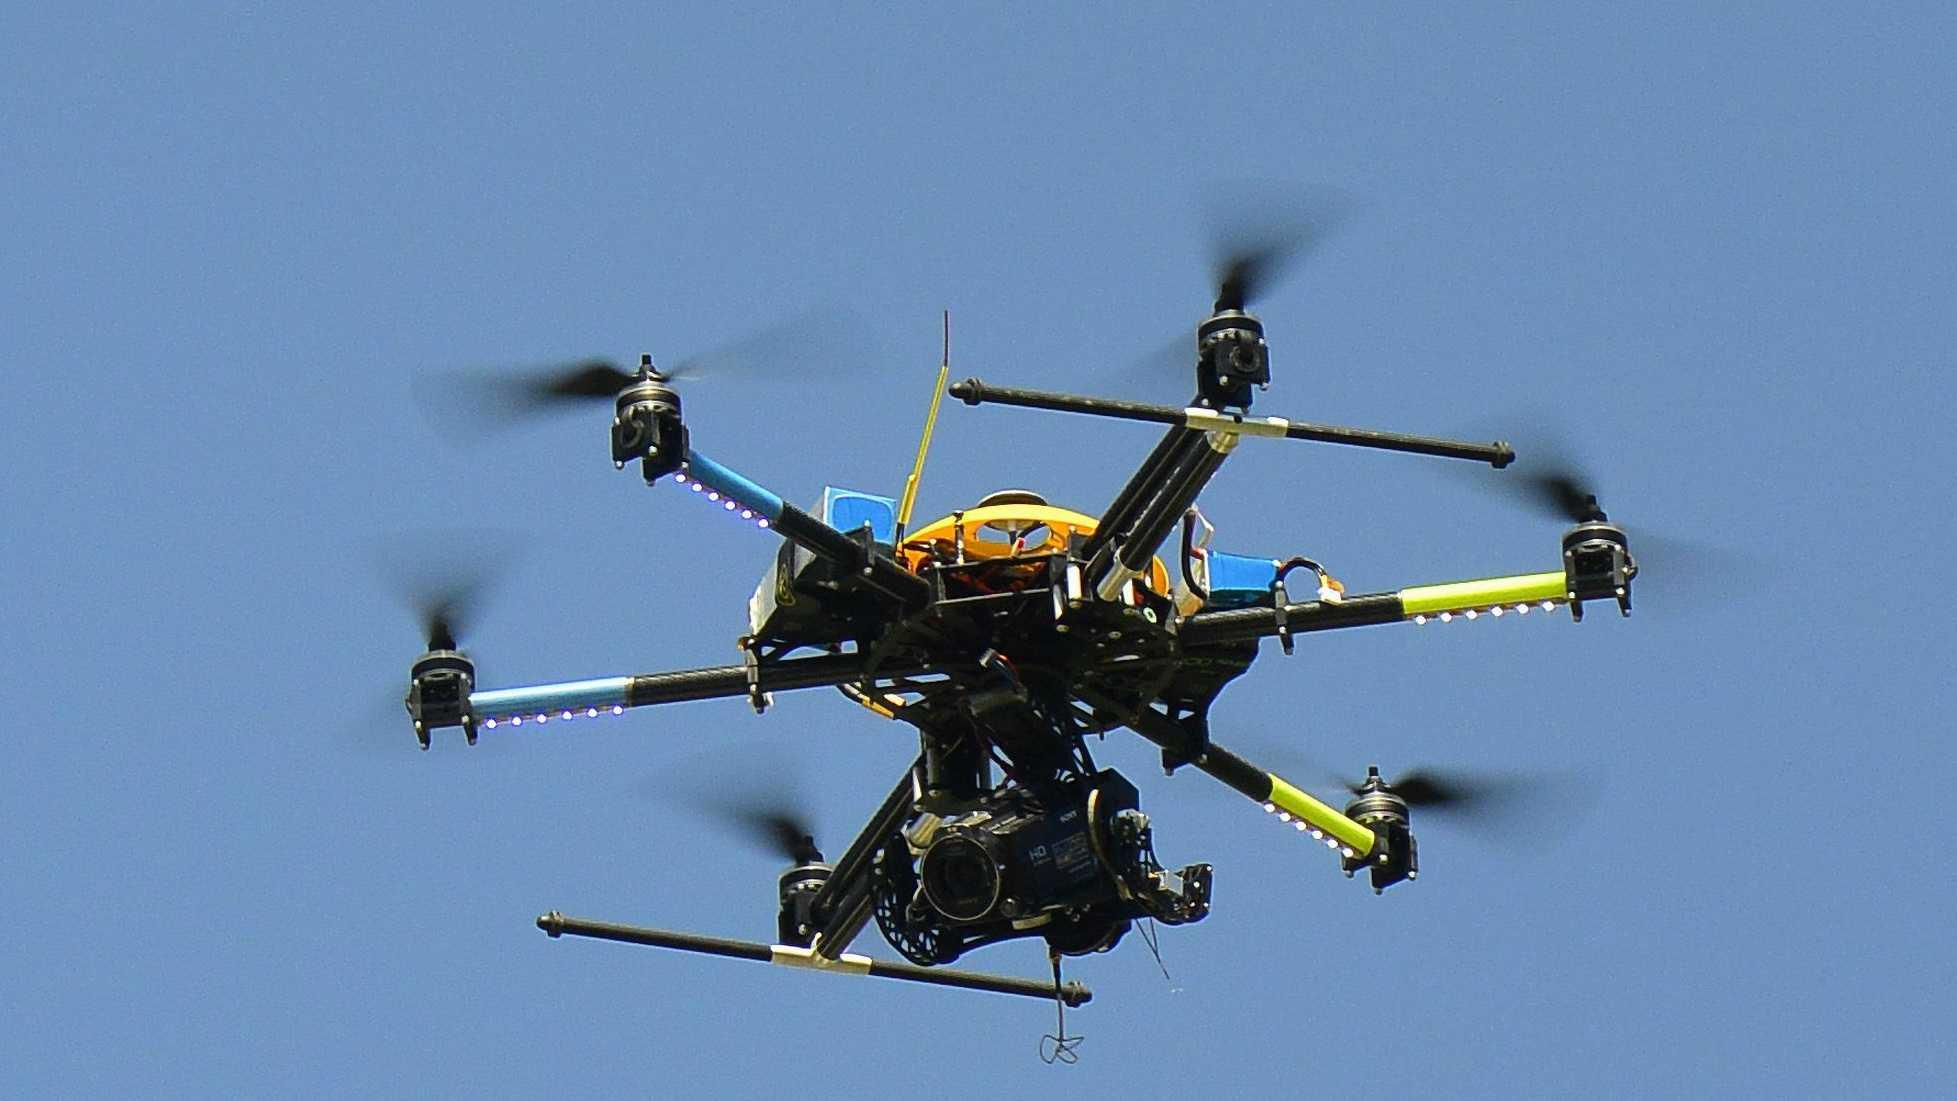 drone-reuters-lg.jpg